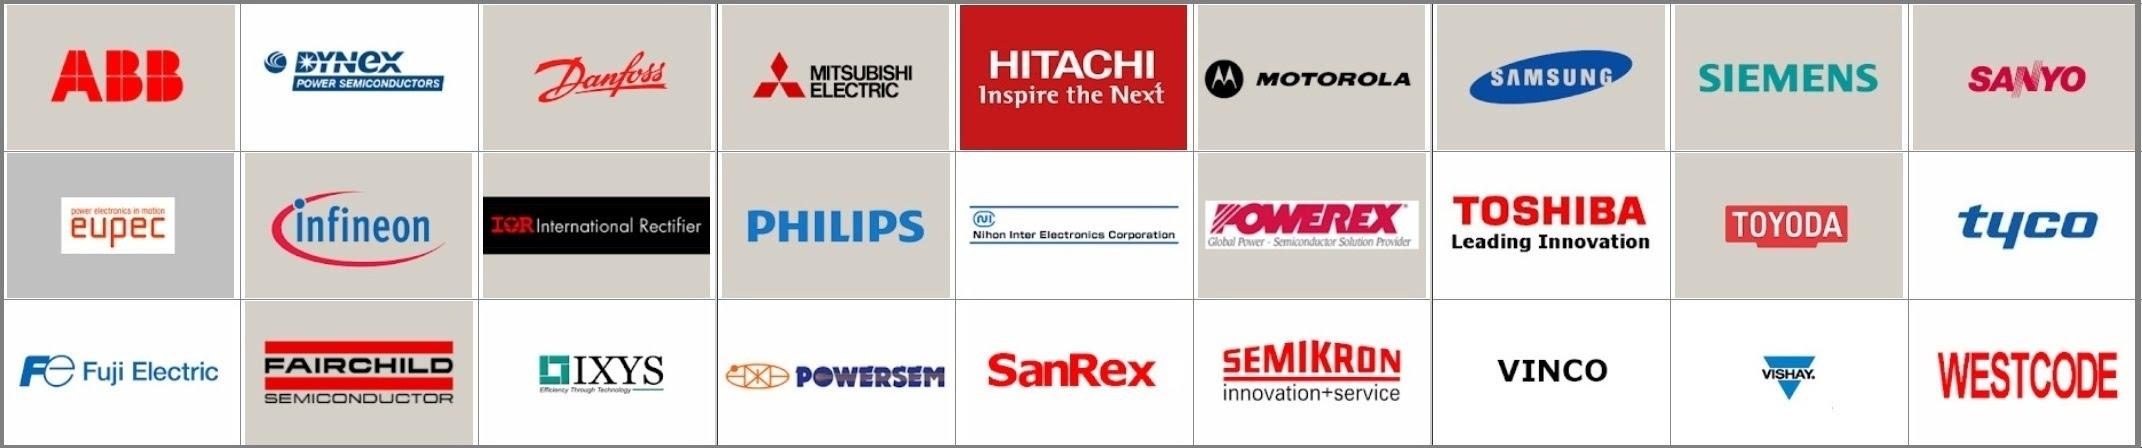 http://www.service-solutions.pro/katalog-postavok/elektronnye-komponenty/igbt-transistor-1